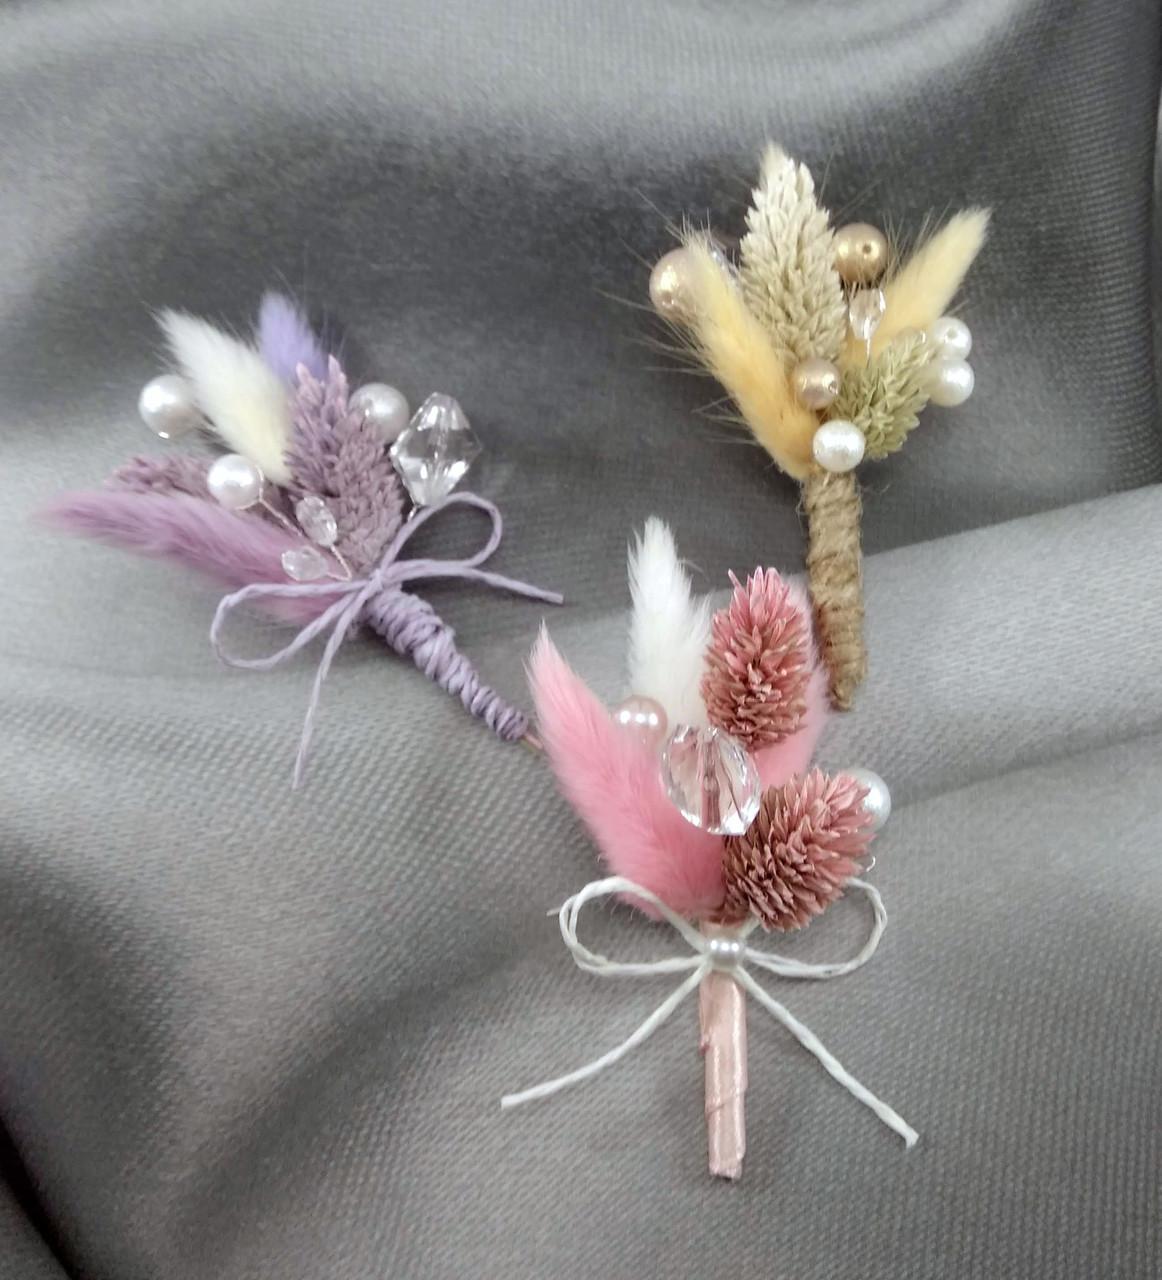 Бутоньерка из лагуруса в разных цветах